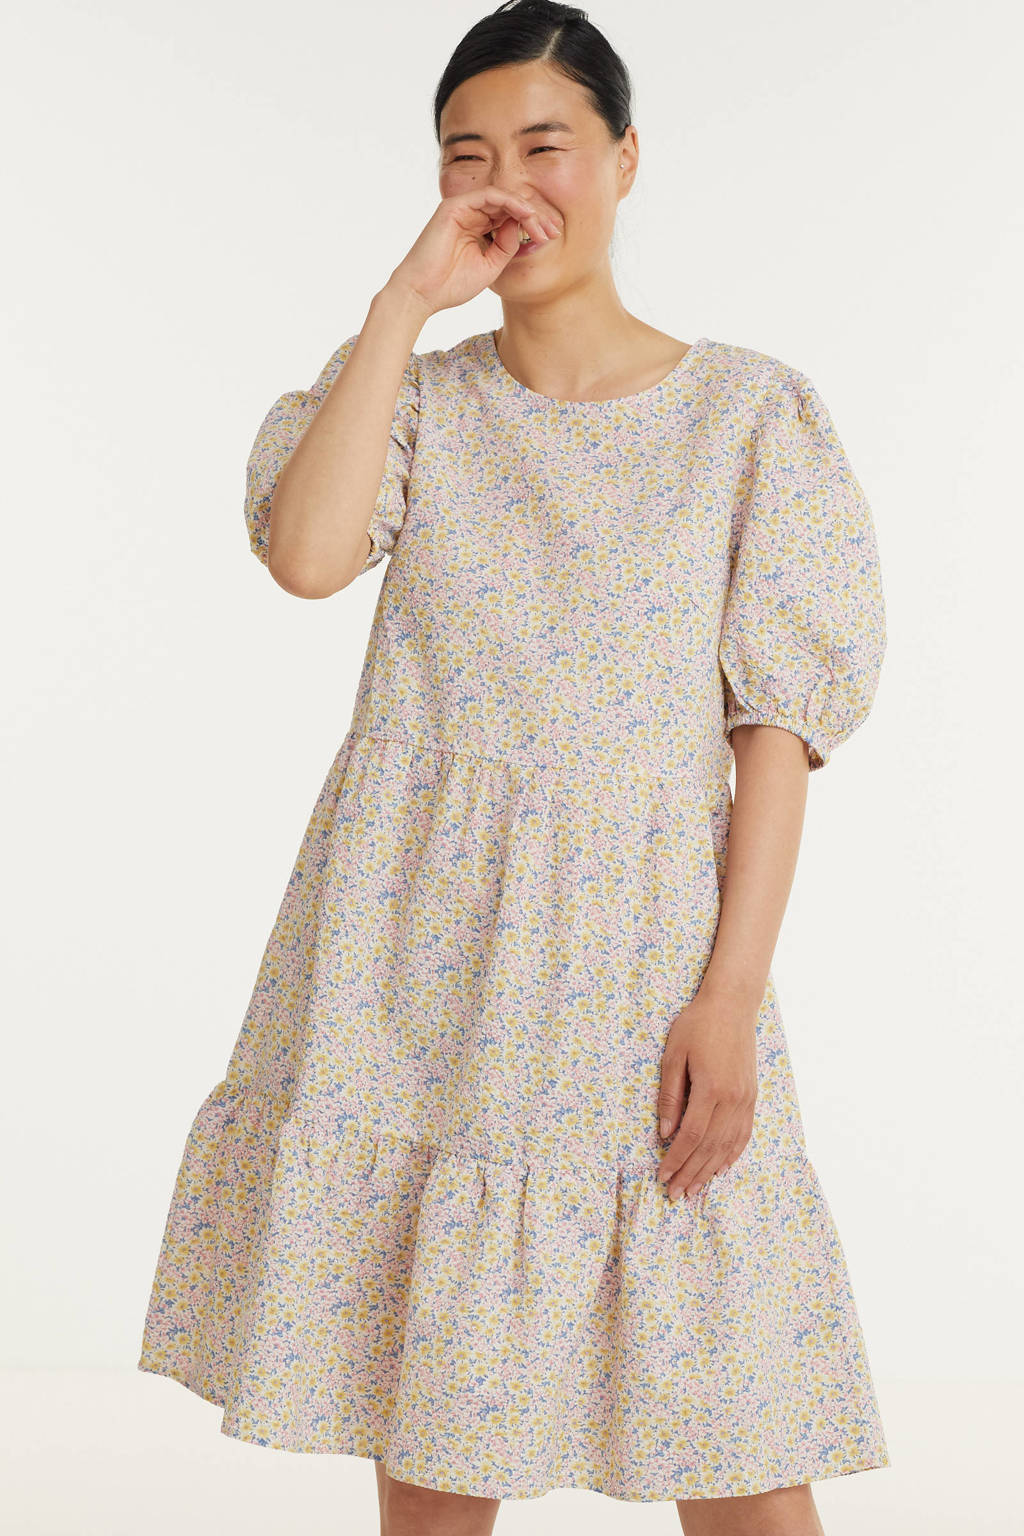 SisterS Point gebloemde trapeze jurk VILKA-DR multi, Multi